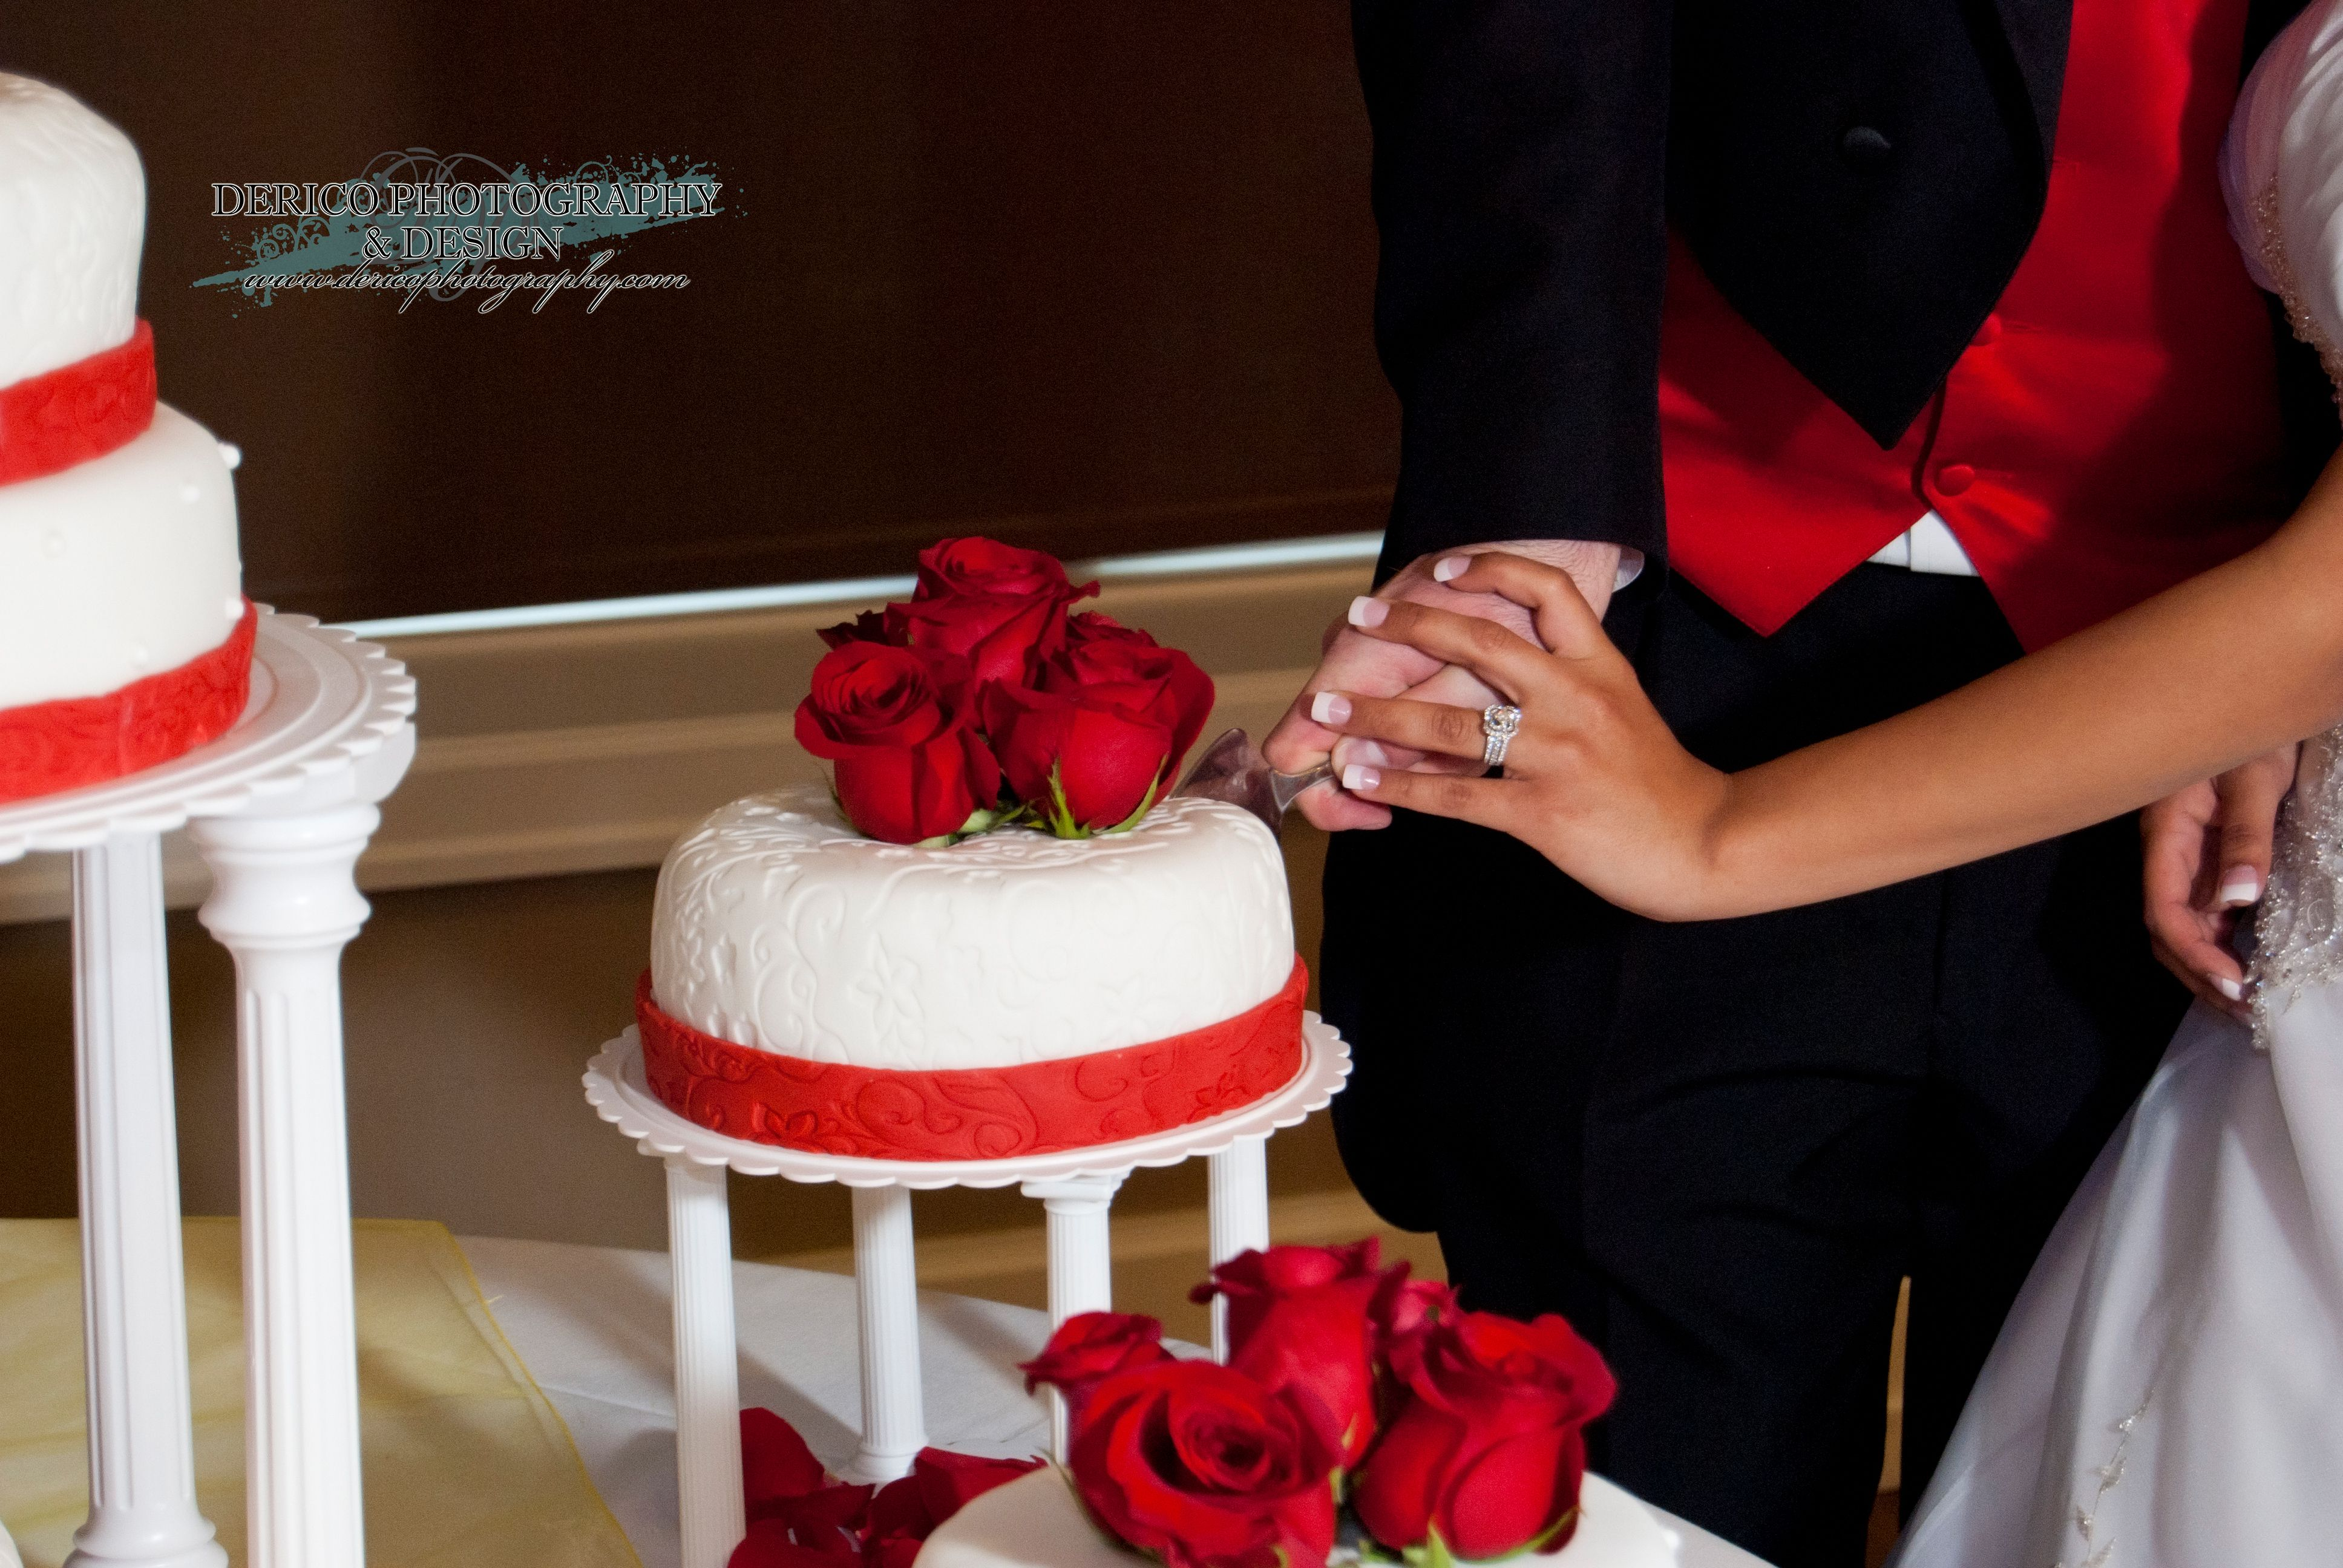 #Wedding #WeddingCake #Roses #DericoPhotography